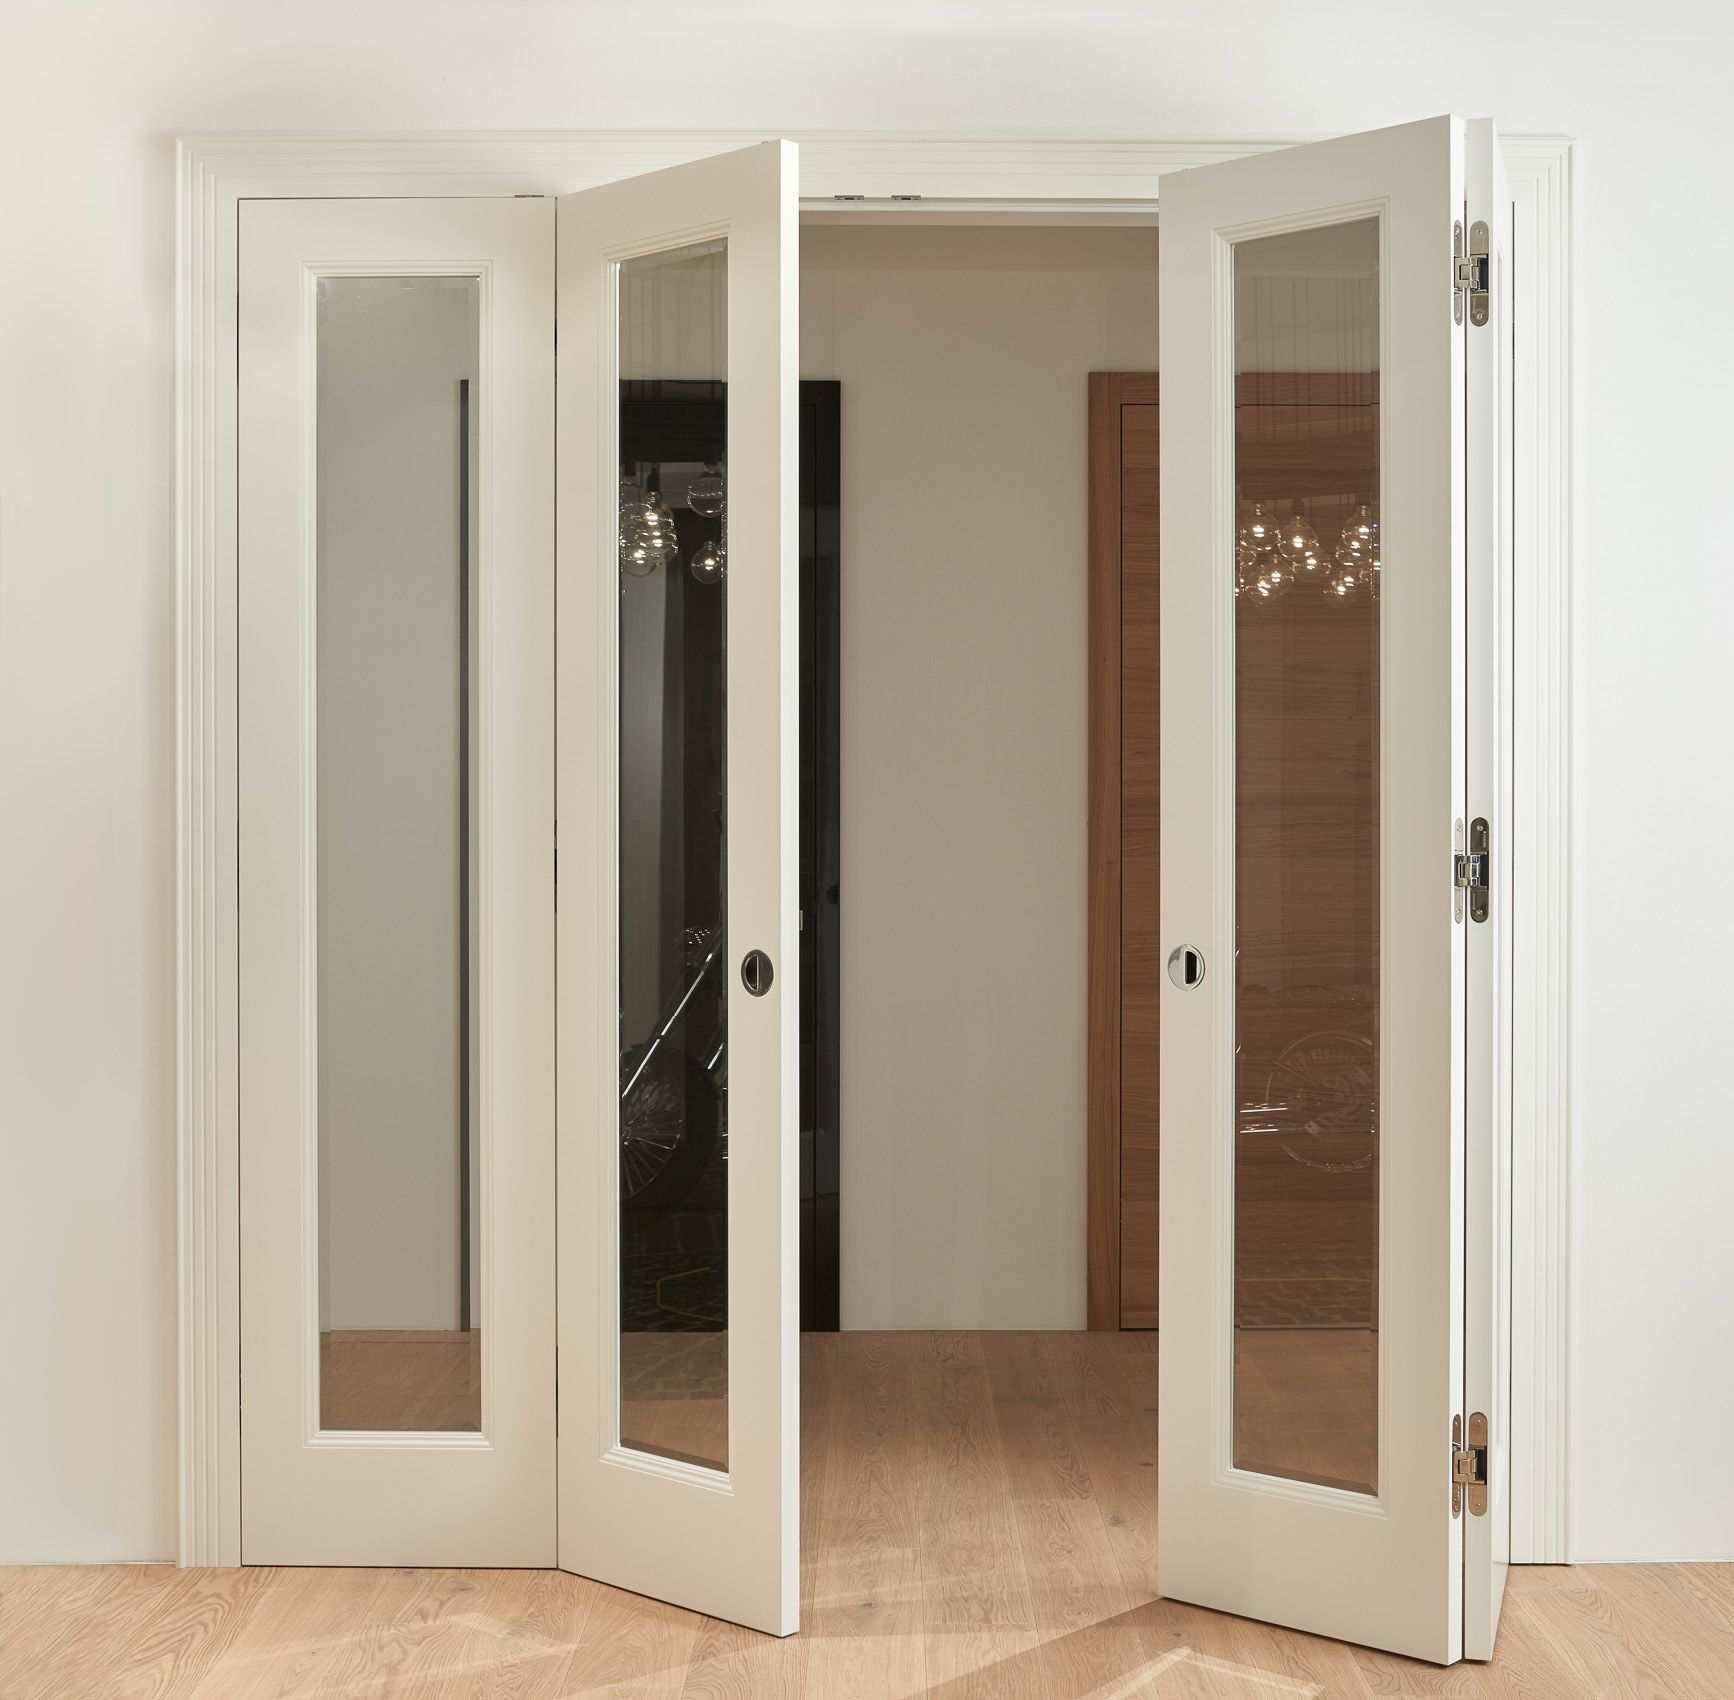 Practical And Beautiful Is What Define Made To Measure Bifold Doors The Folding Door With A Perf Internal Glass Doors Double Doors Interior Room Divider Doors